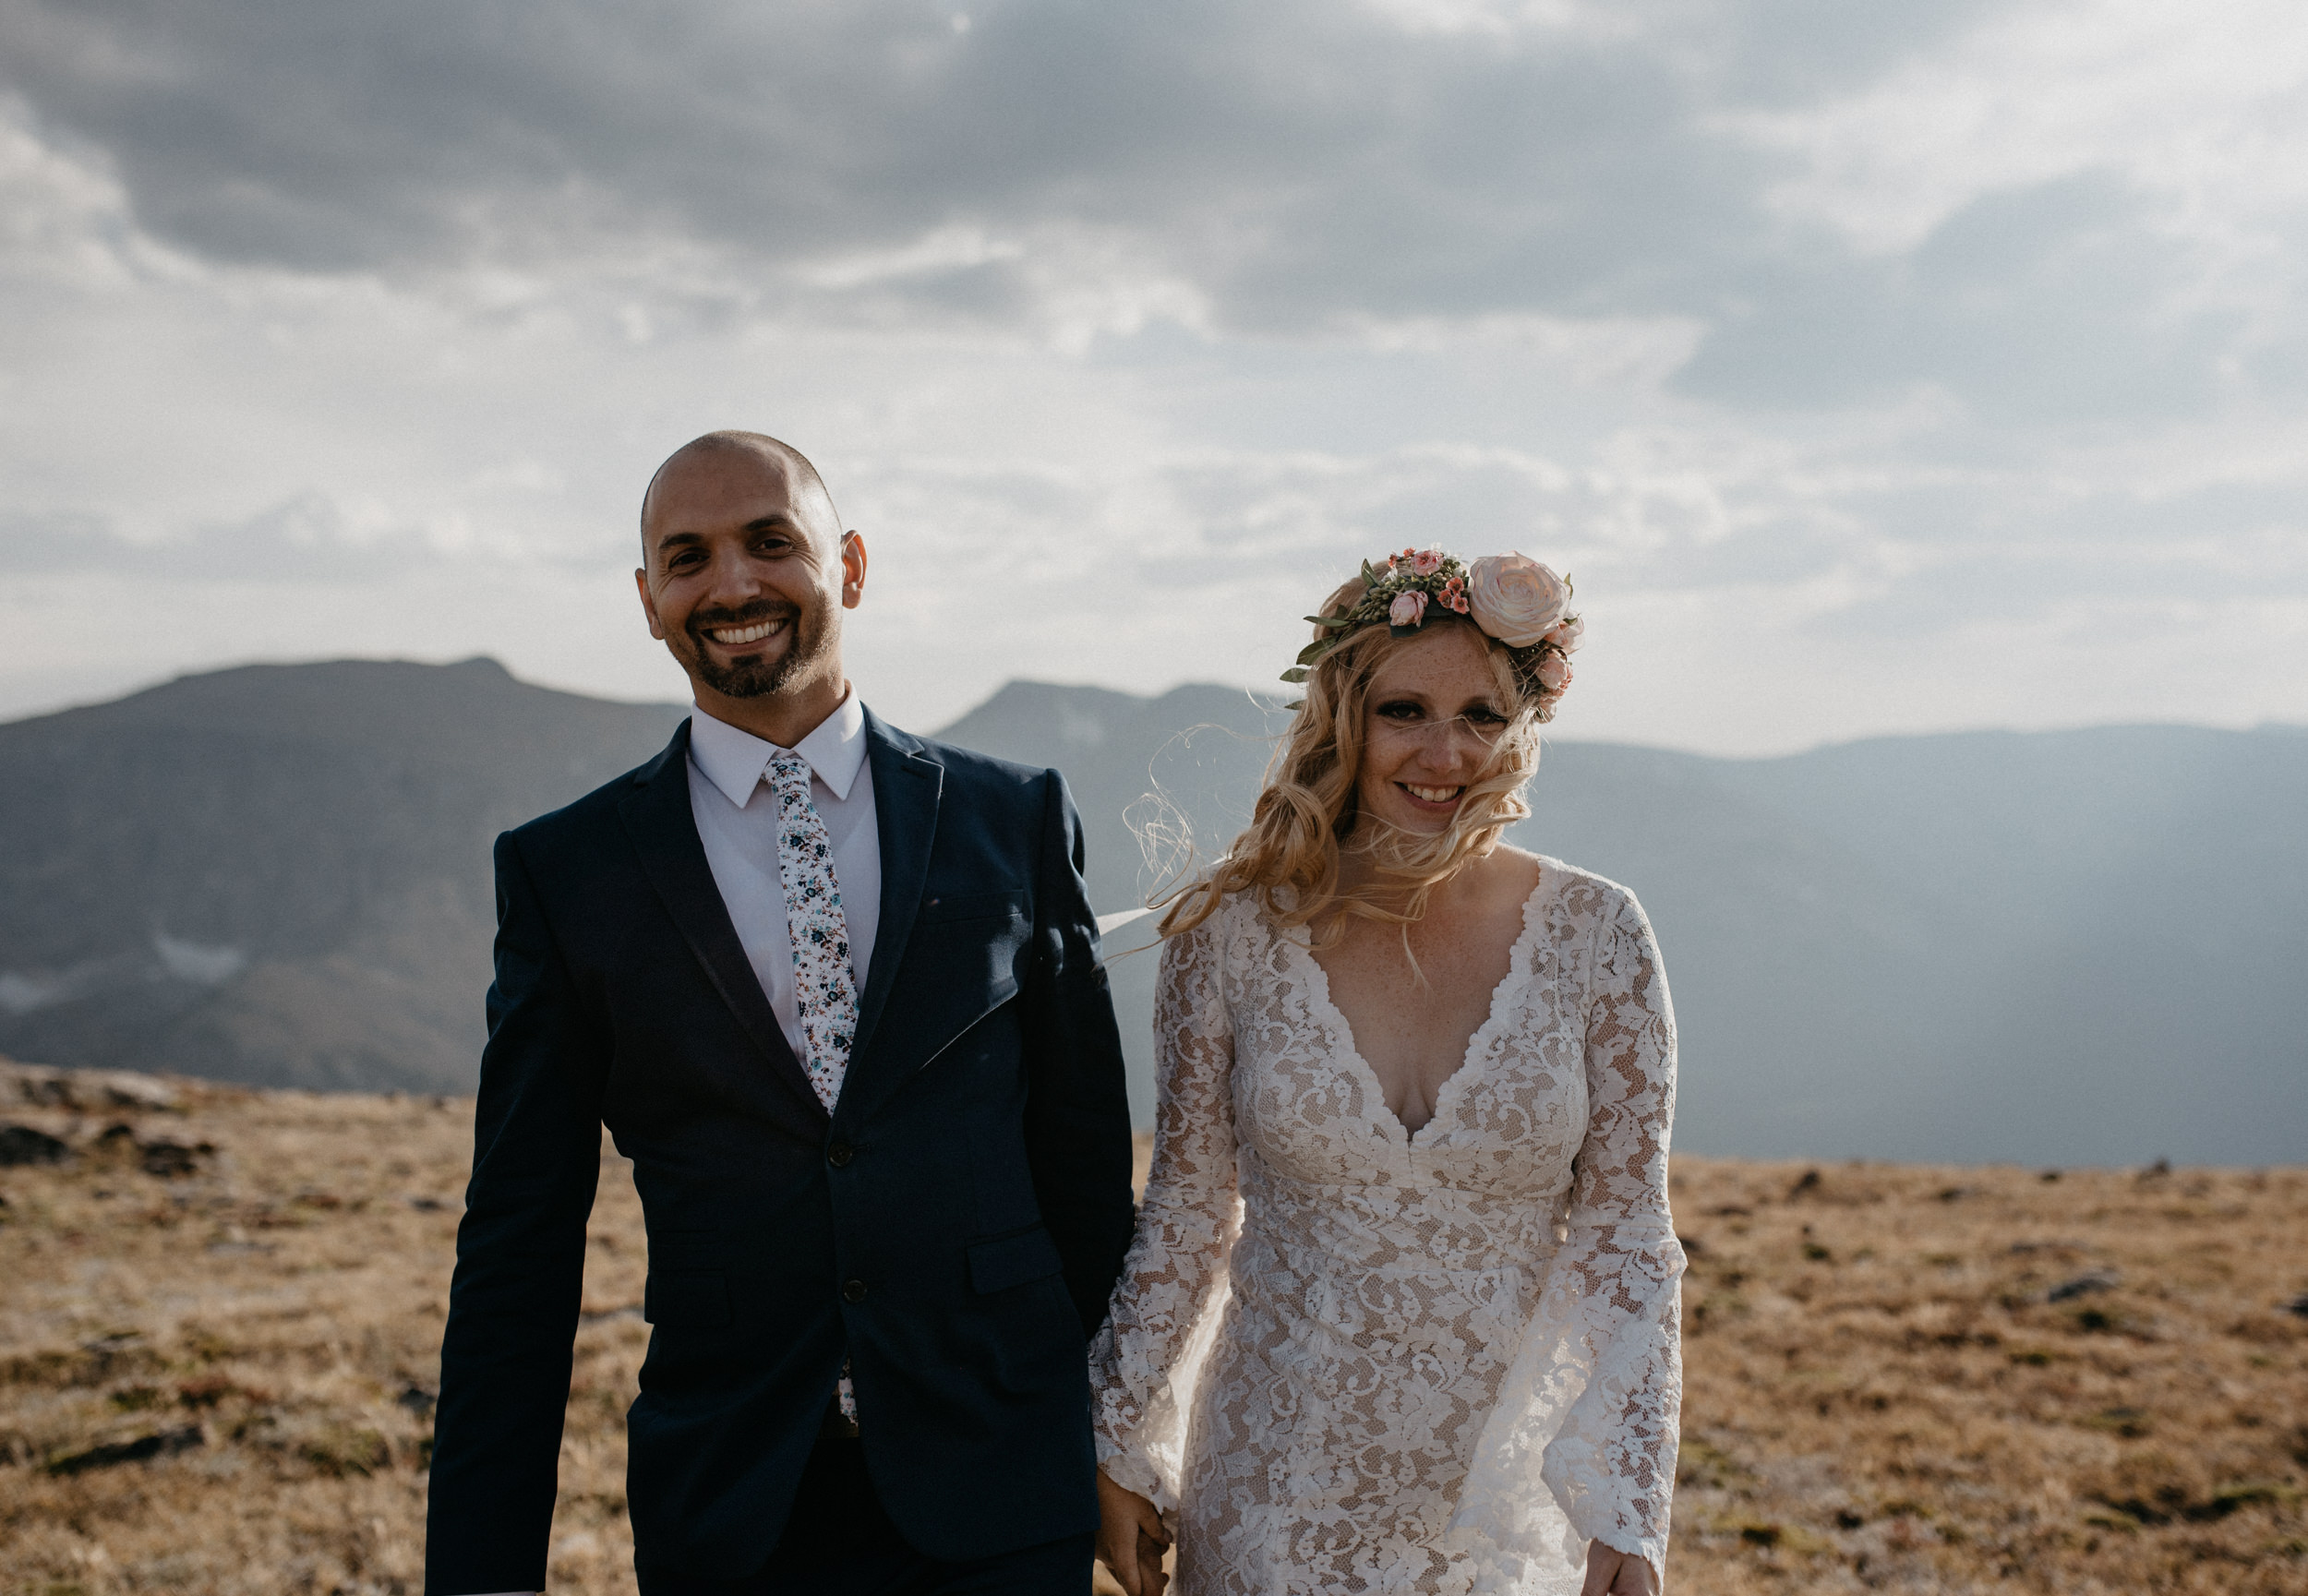 Mountain adventure elopement and wedding photographer. Colorado elopement in Rocky Mountain National Park.